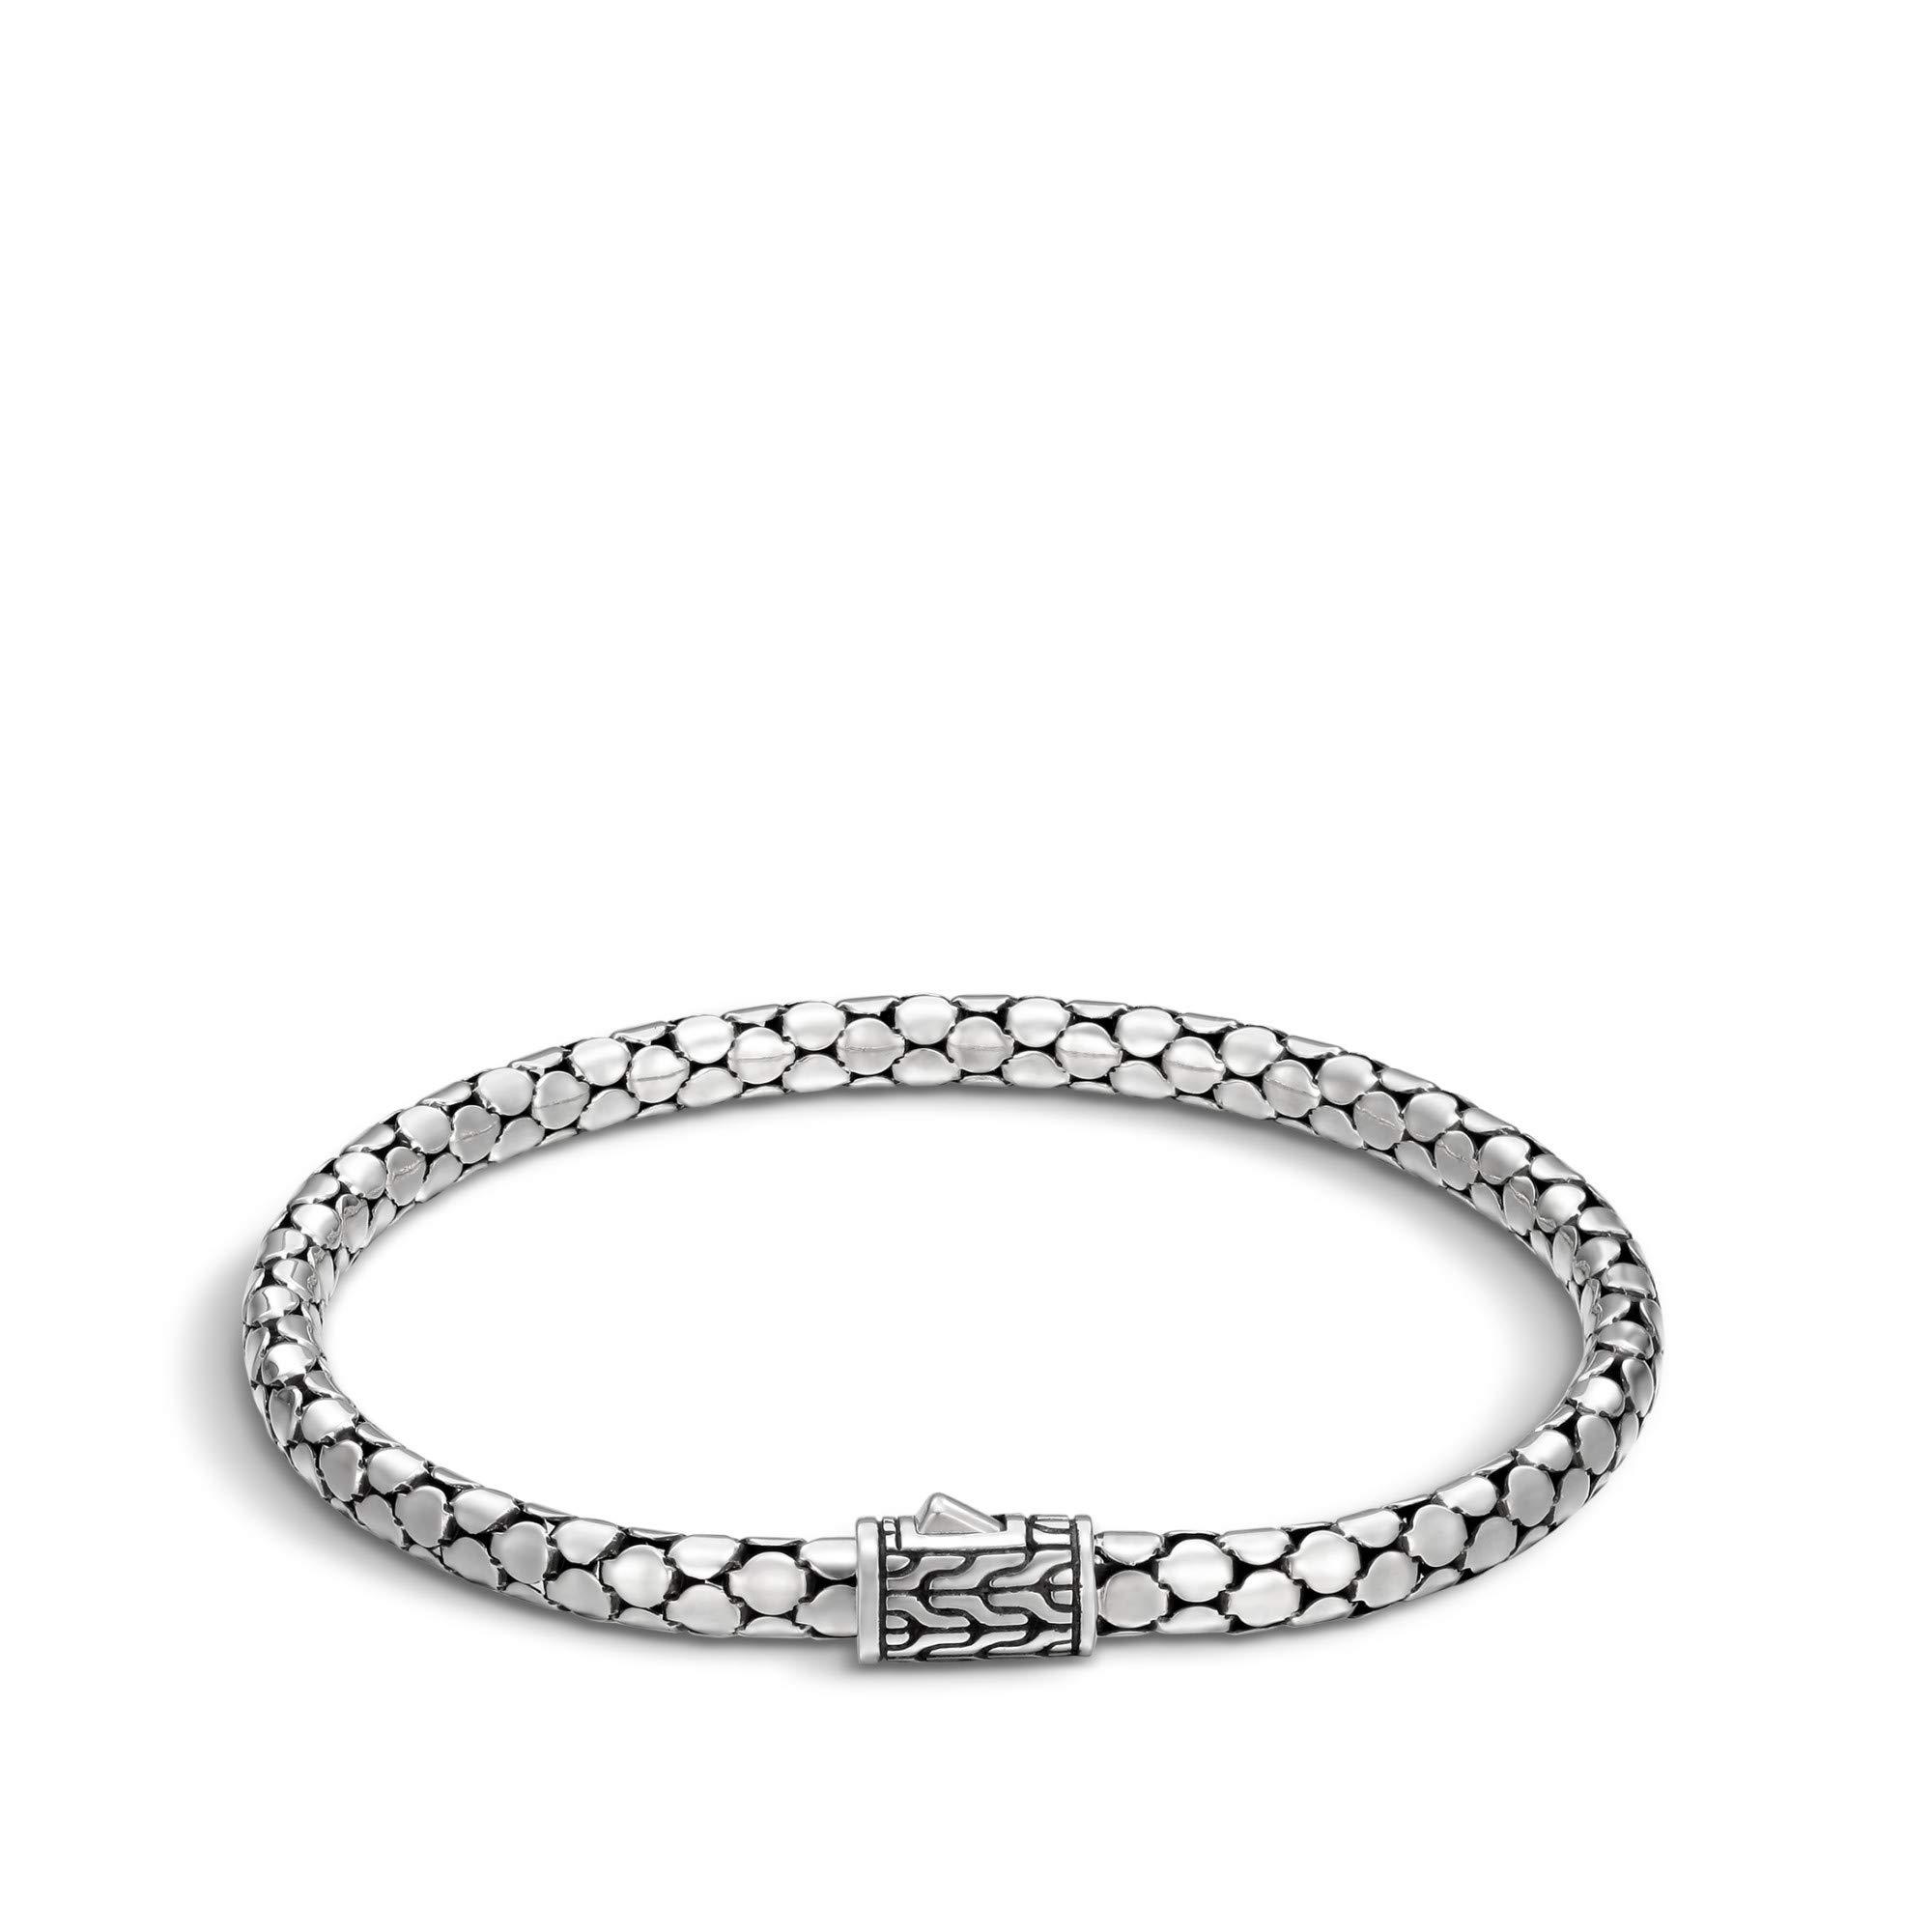 John Hardy Women's Dot Silver Slim Chain Bracelet, Size M